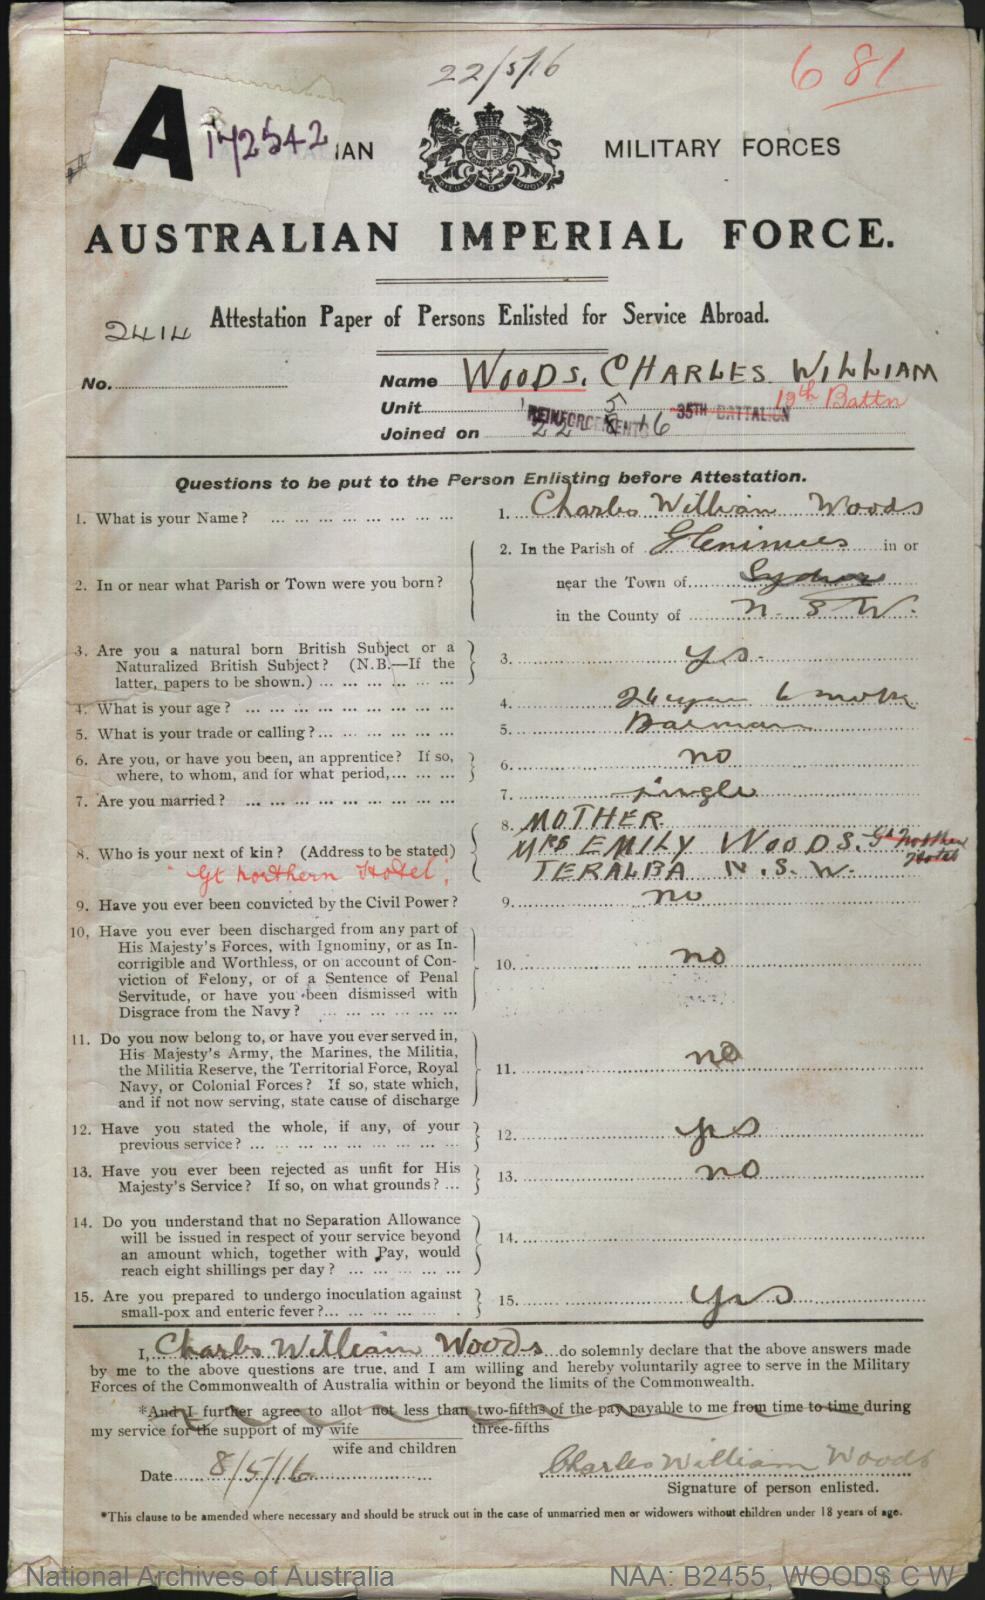 Woods Charles William : SERN 2414 : POB Glen Innes NSW : POE Teralba NSW : NOK M Woods Emily